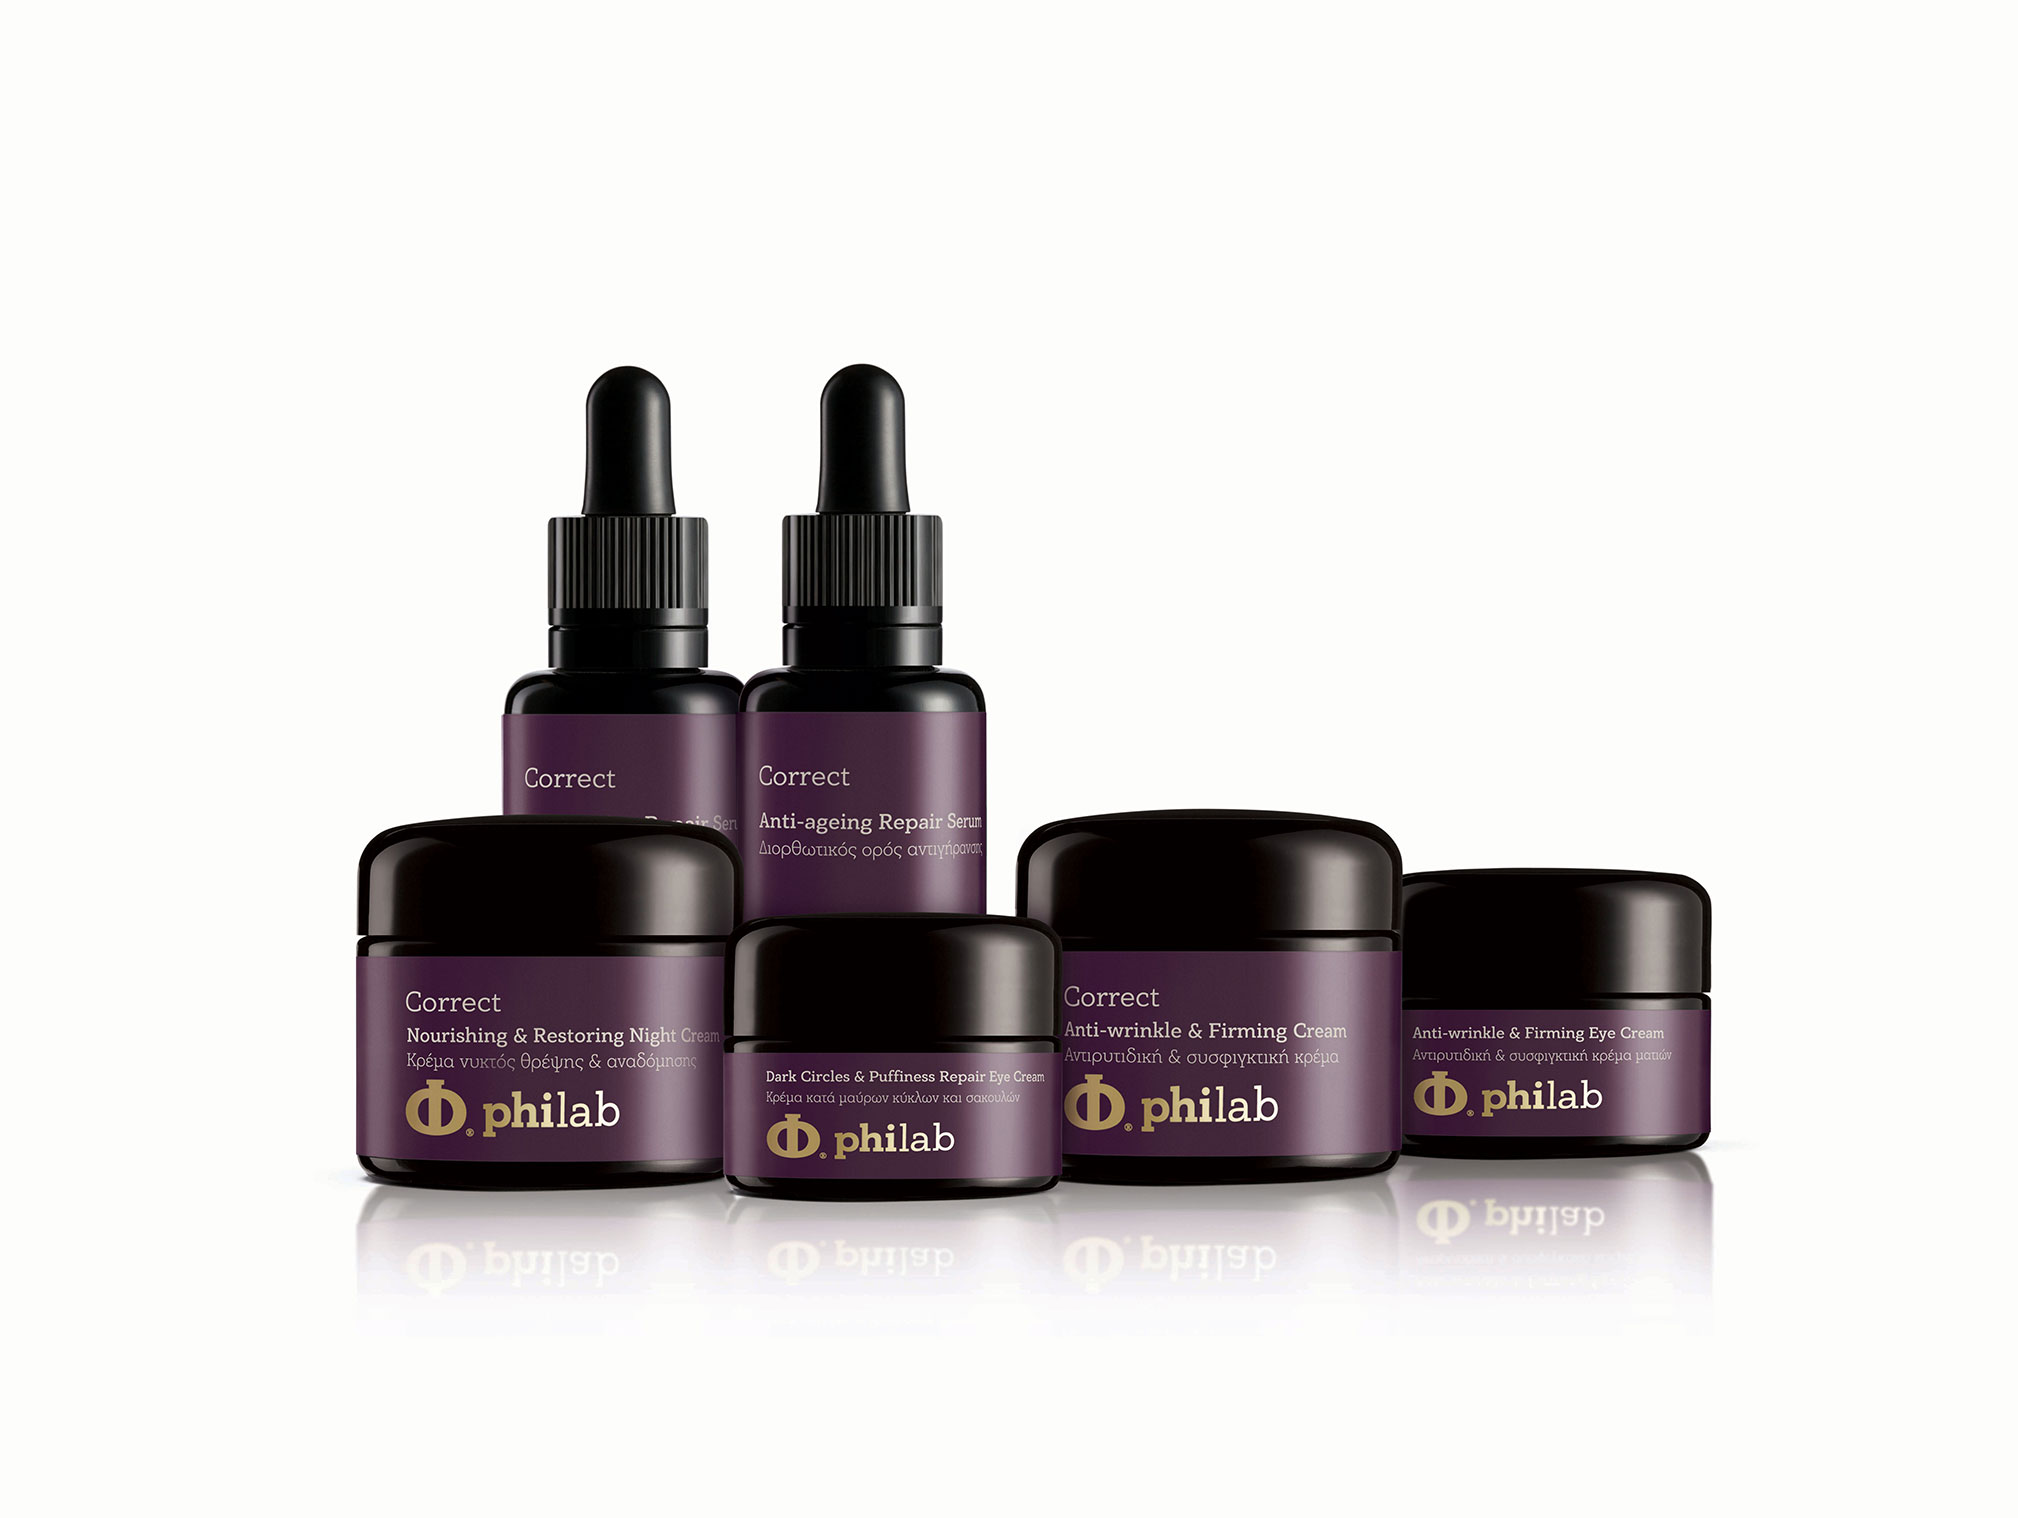 Philab cosmetics